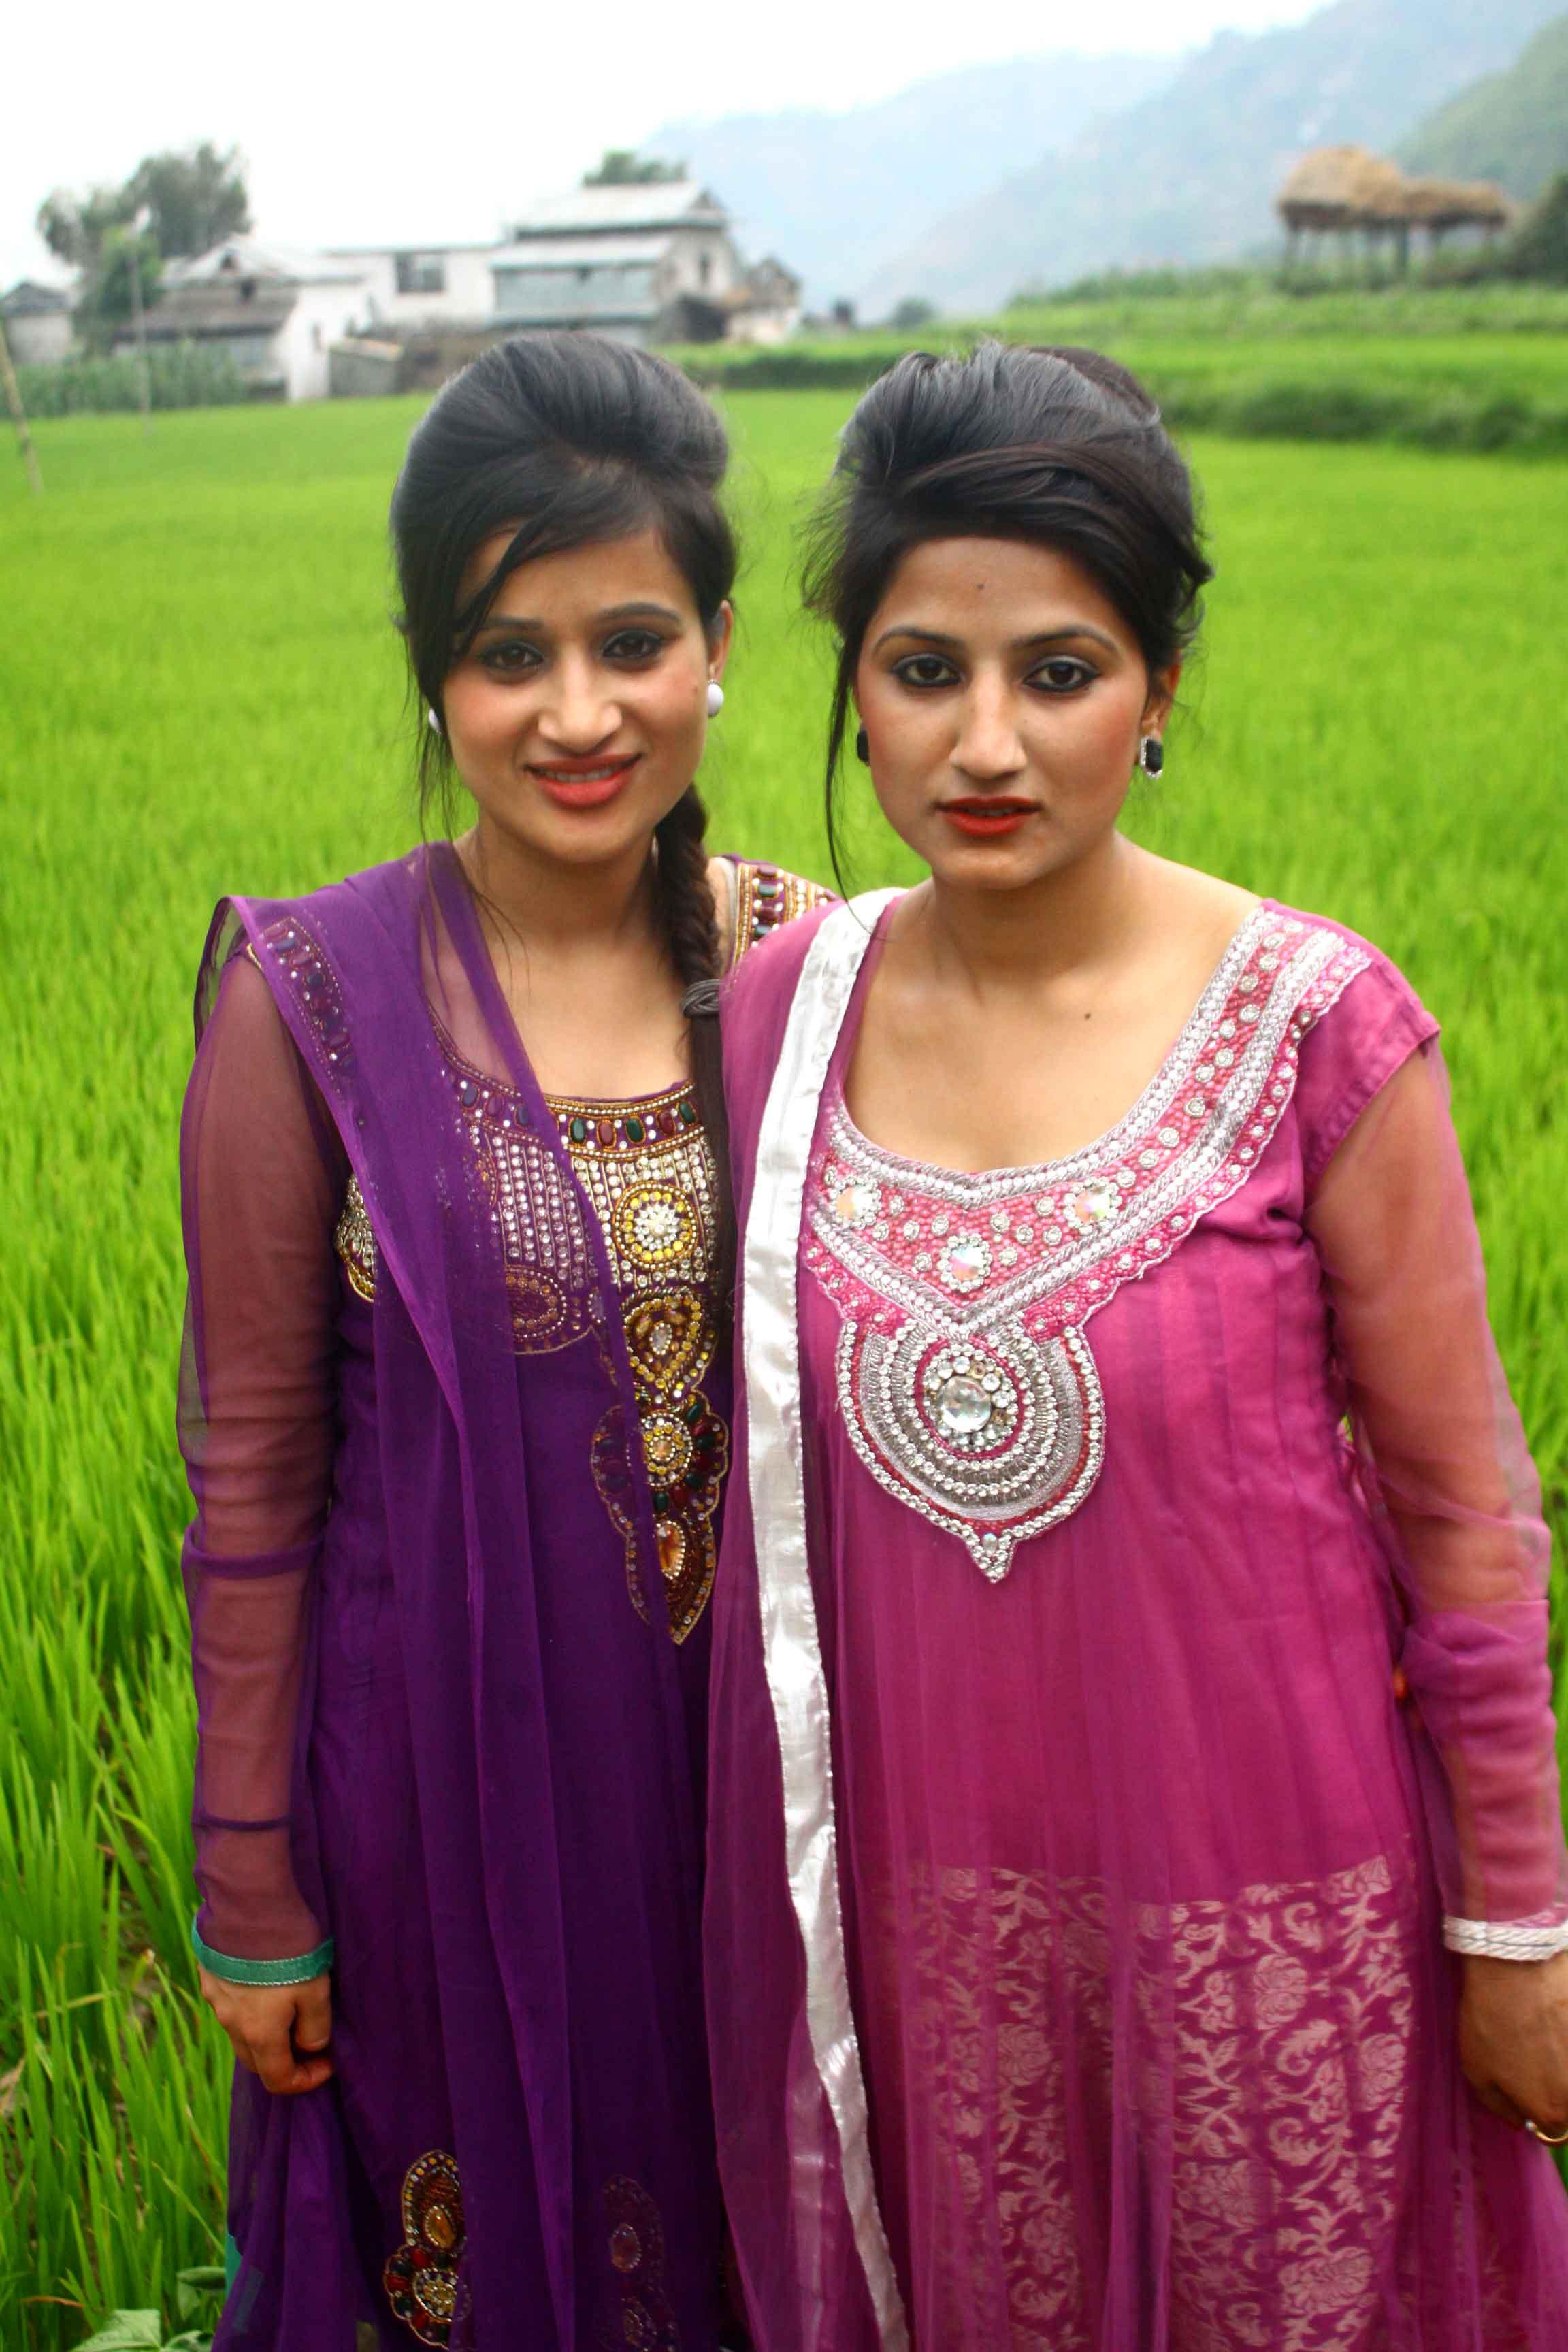 Kathmandu Nightlife Women 22066 | ENEWS